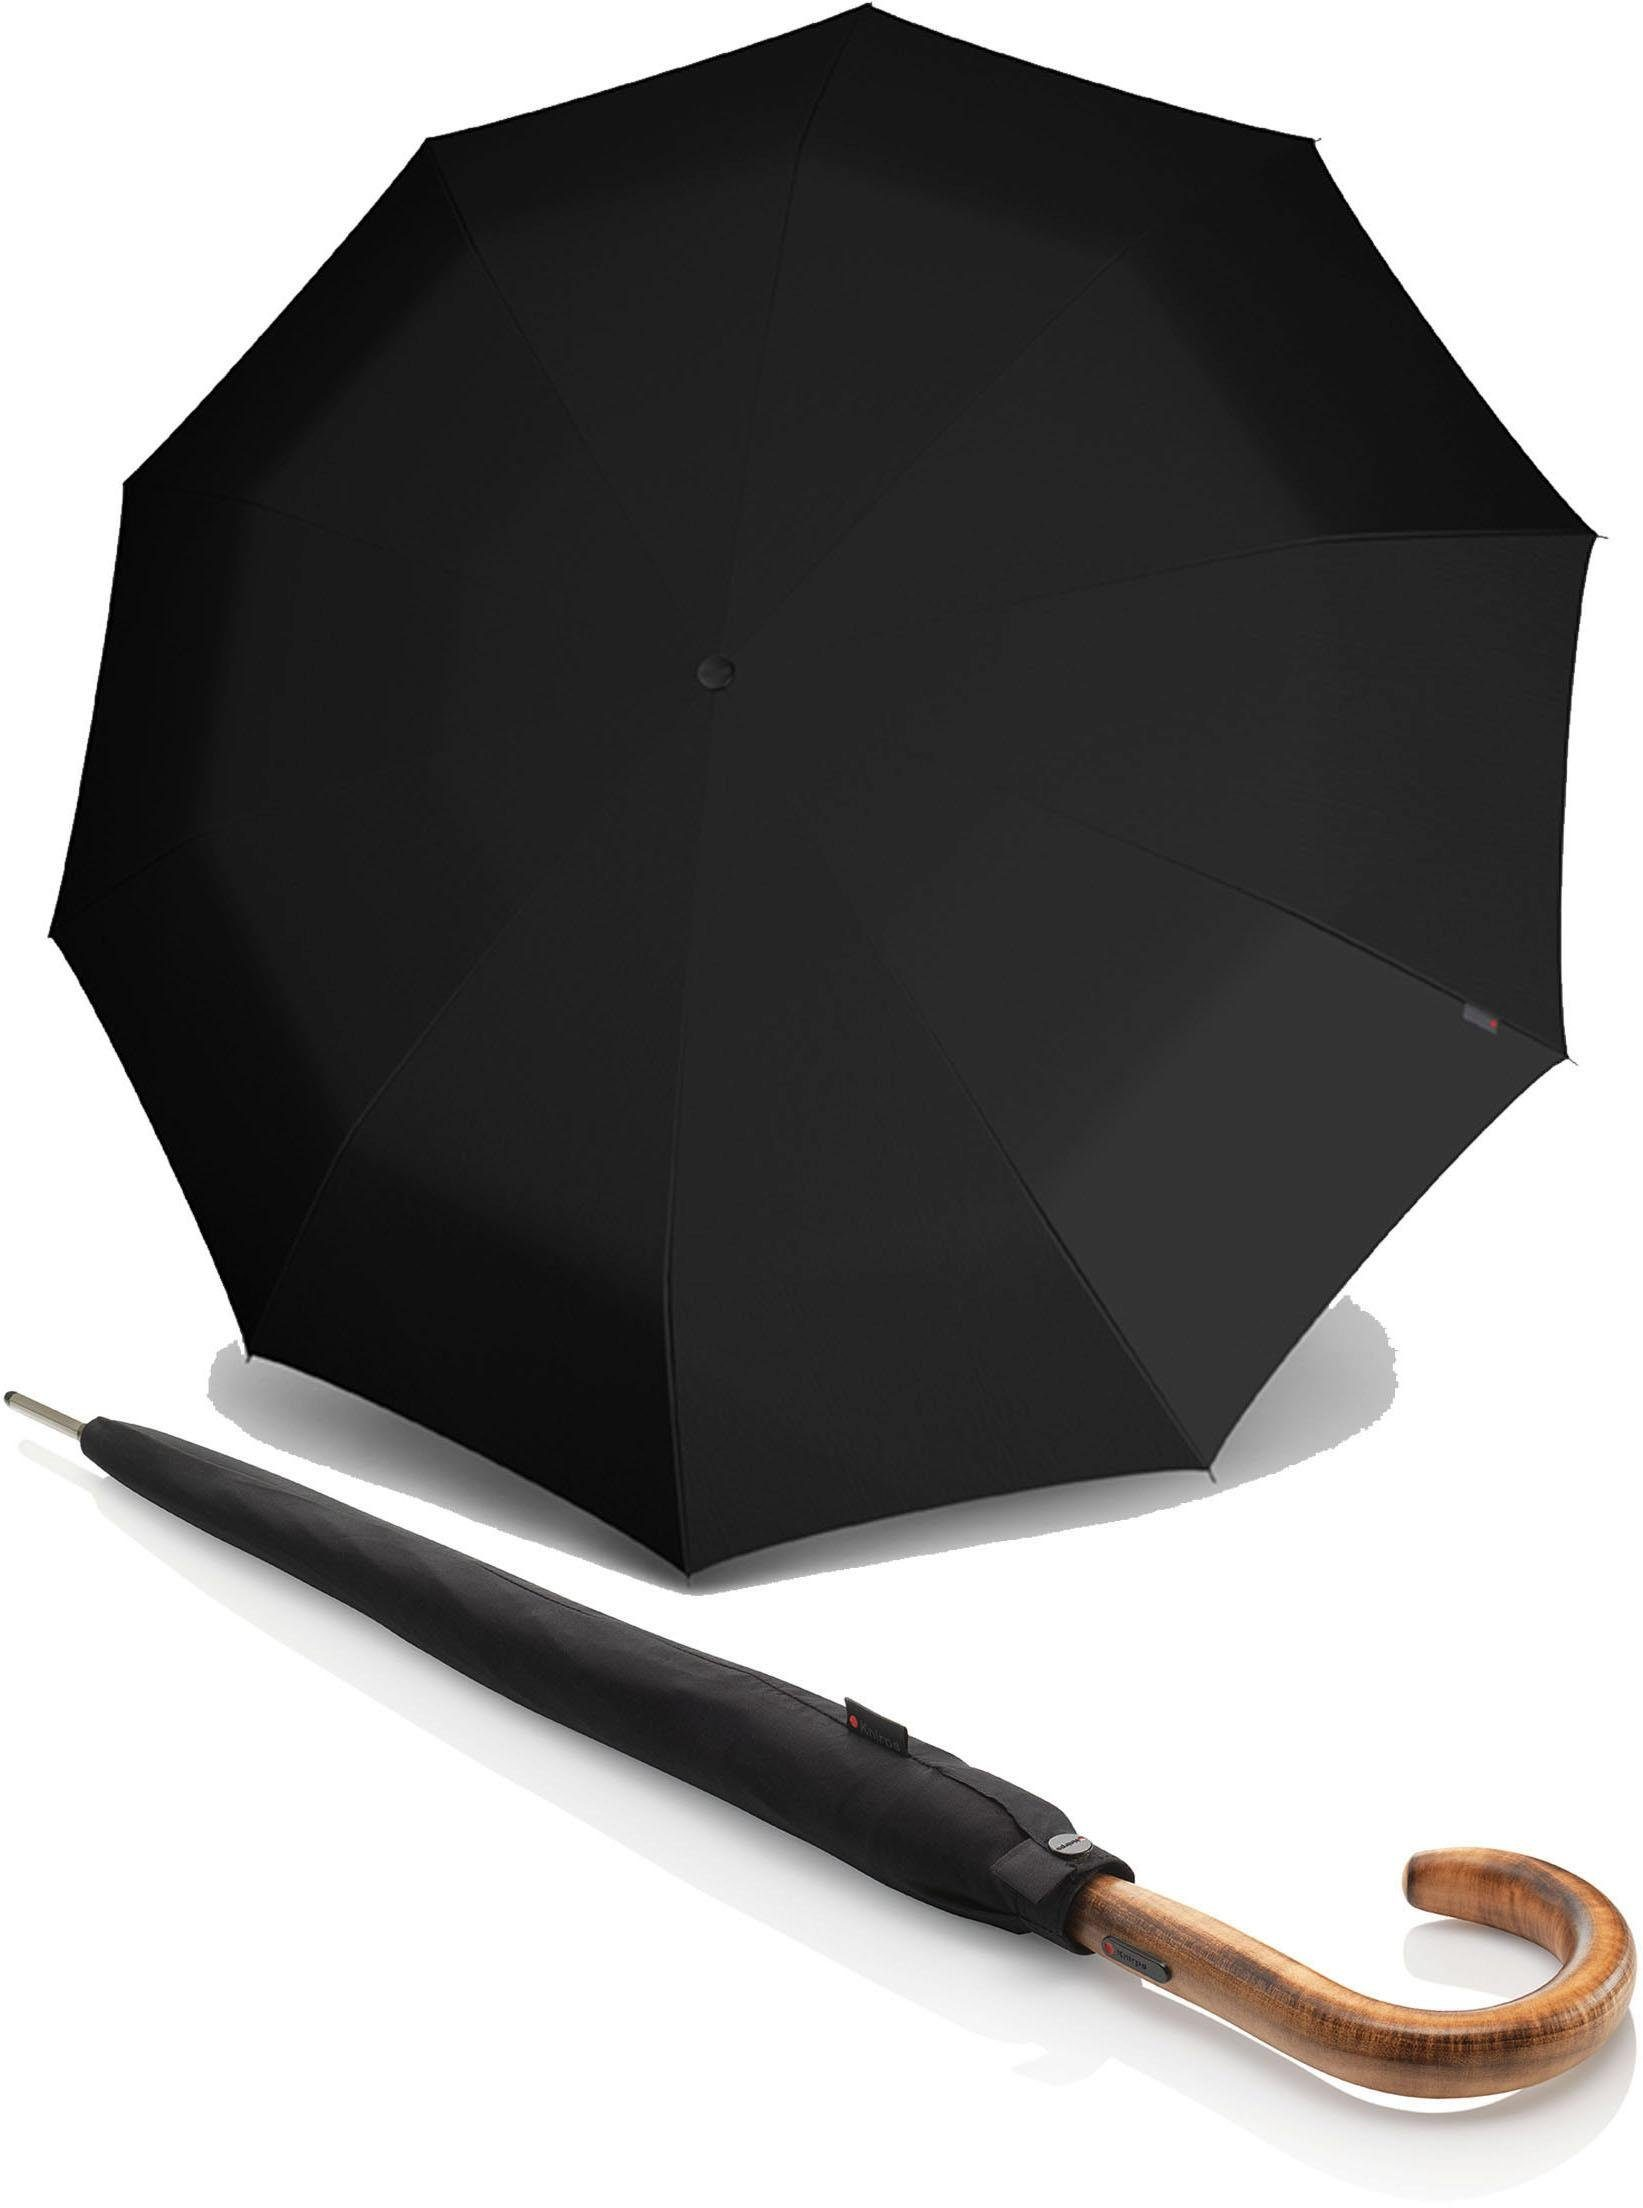 Knirps® Regenschirm - Langschirm, »S.770 Long Automatic black «